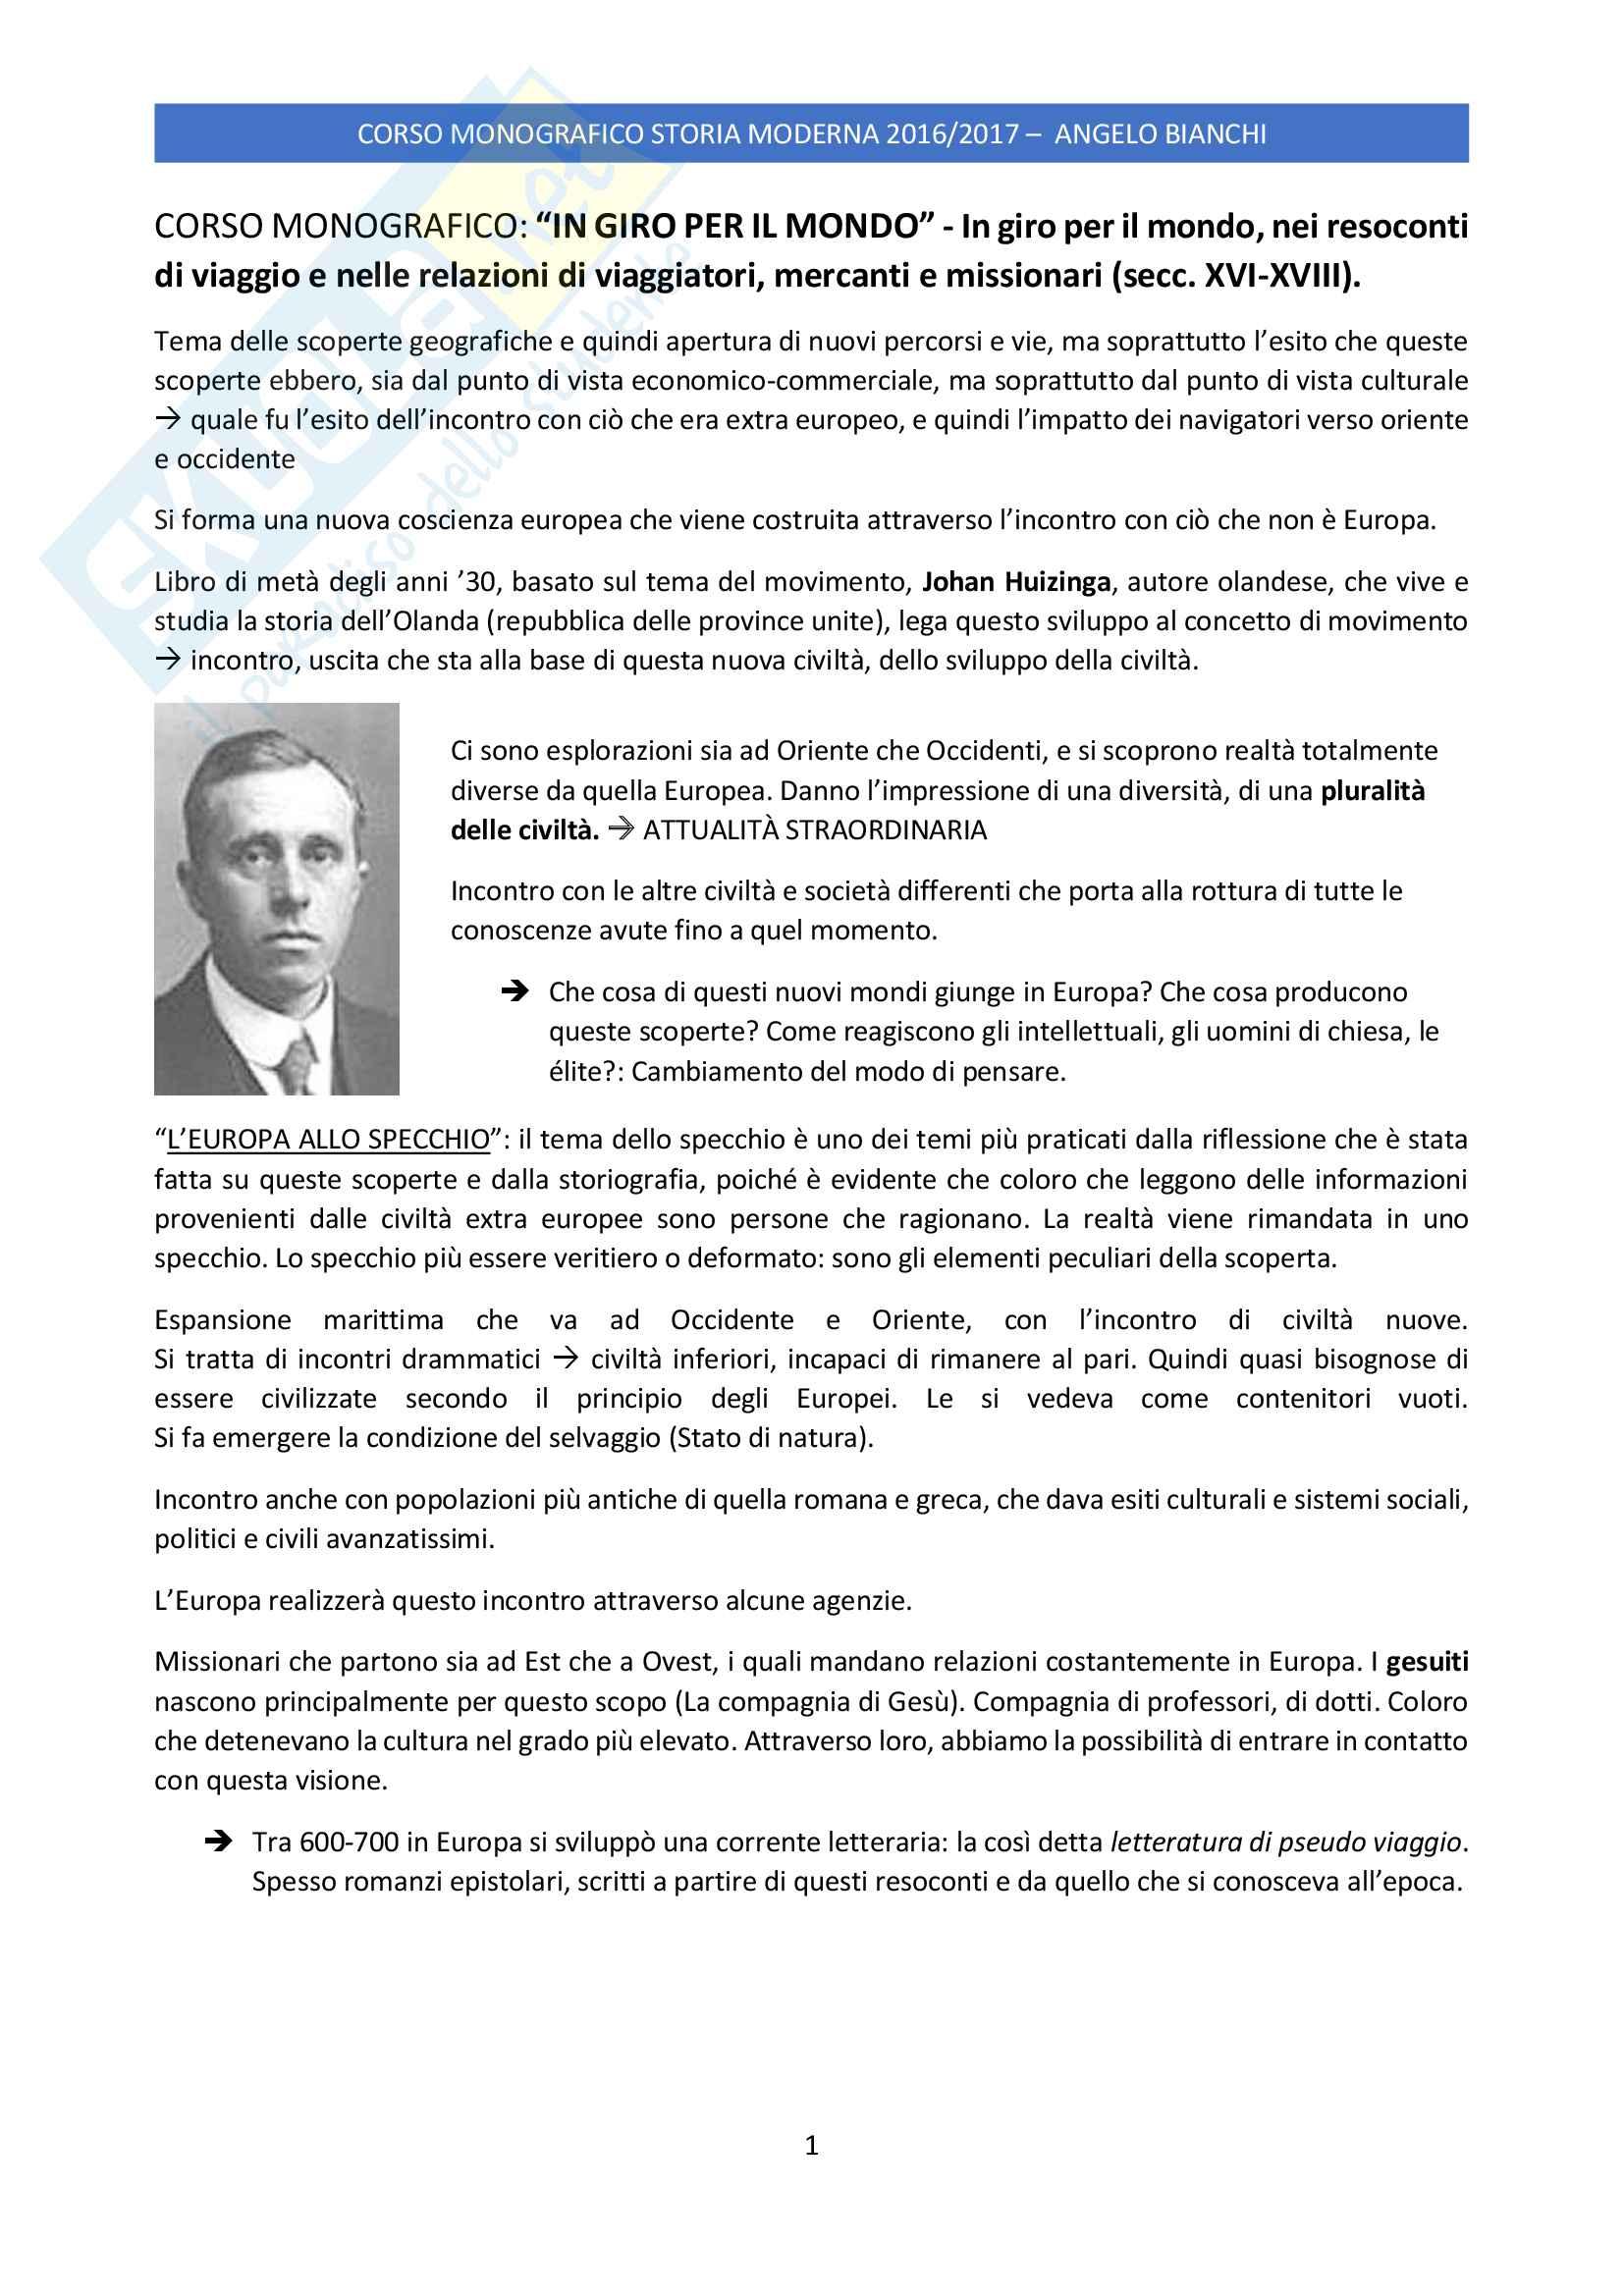 Appunti personali esame Storia Moderna Monografico, prof. Angelo Bianchi